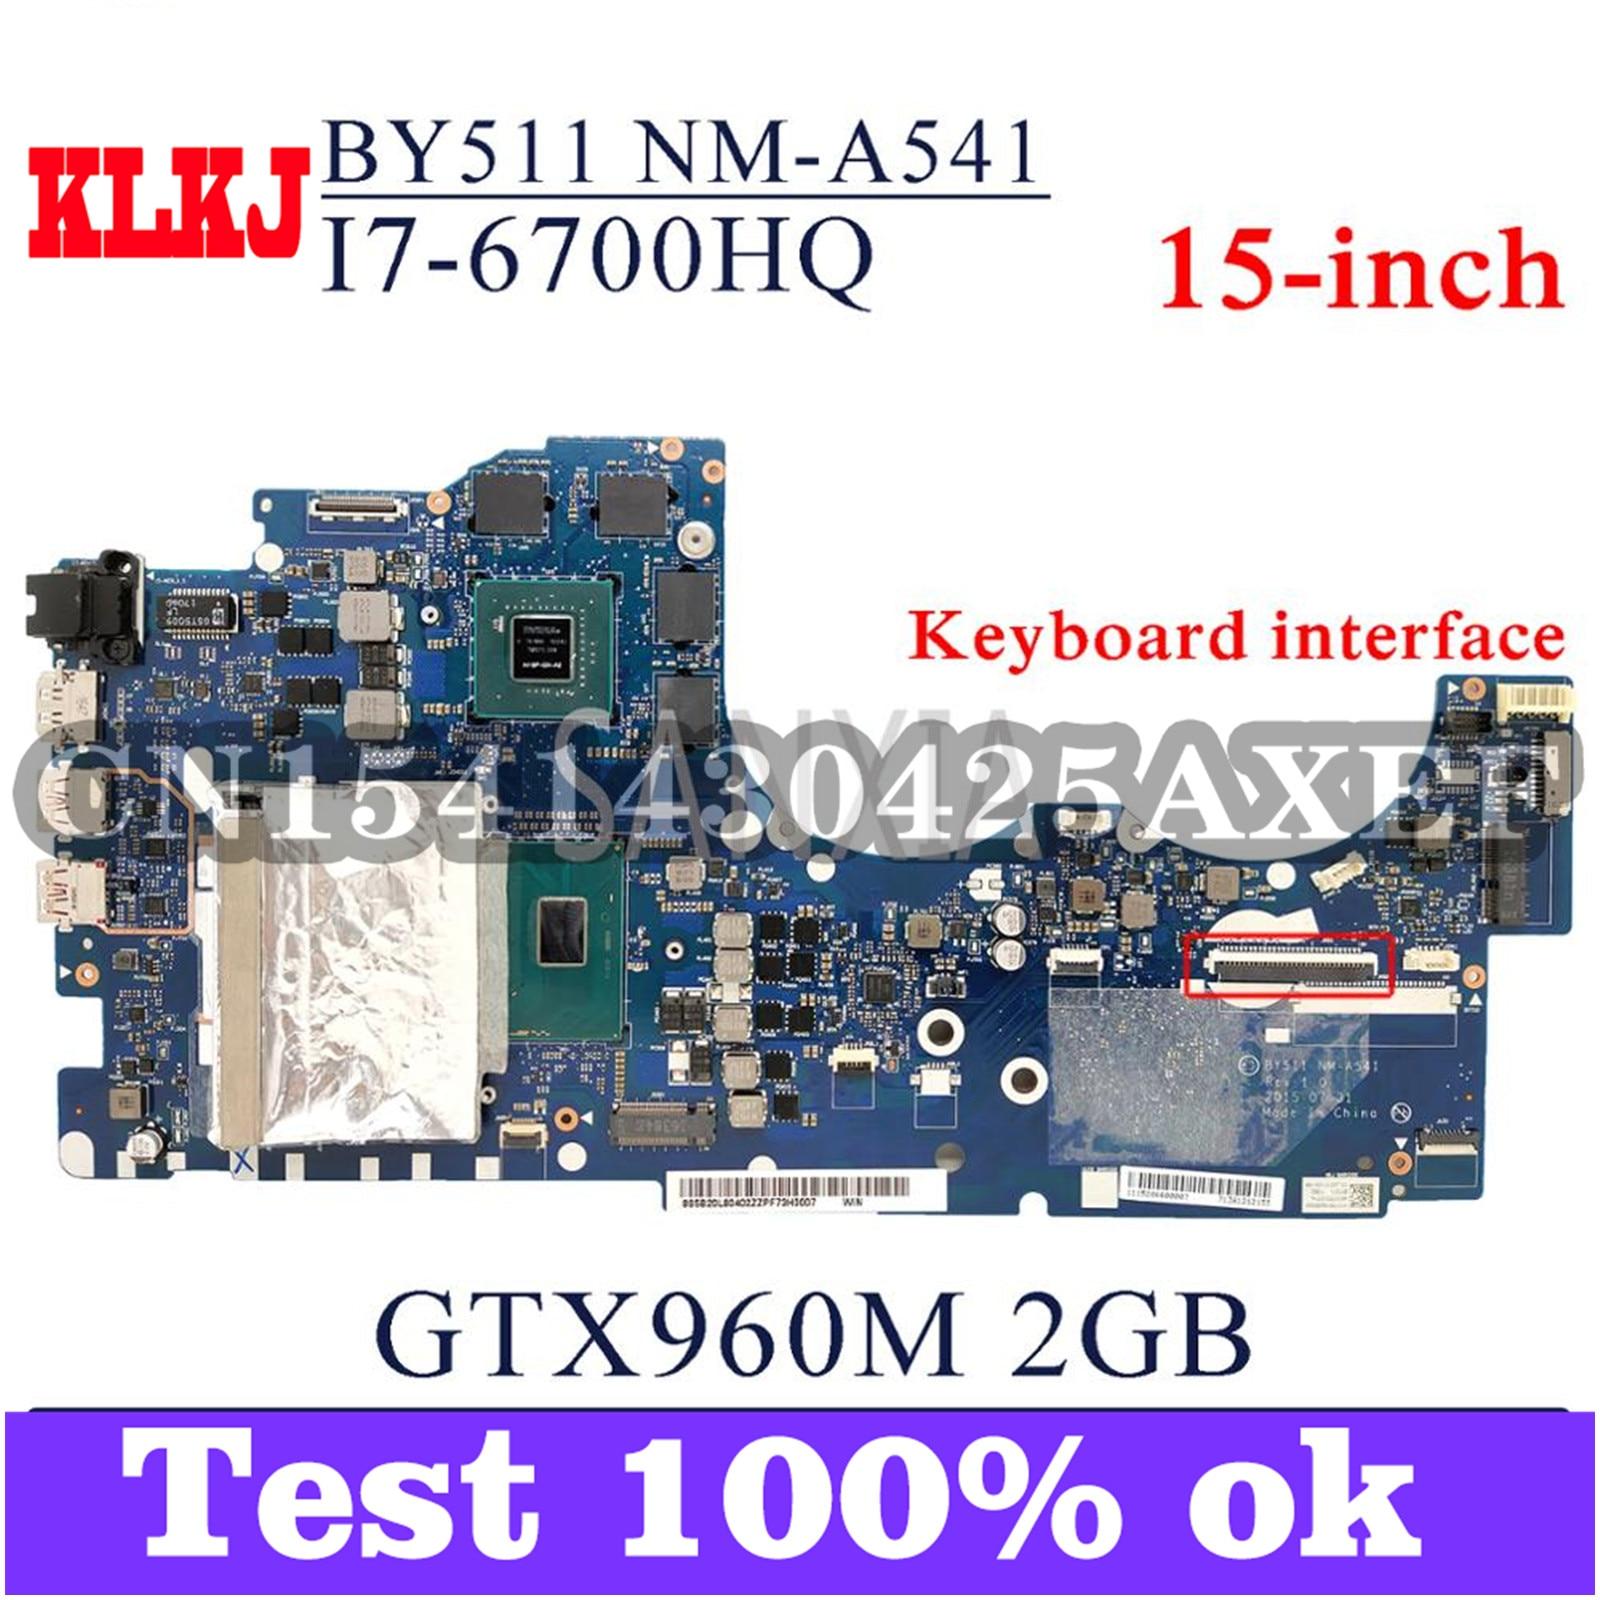 KLKJ BY511 NM-A541 اللوحة الأم للكمبيوتر المحمول لينوفو Y700-15ISK (15 بوصة) اللوحة الرئيسية الأصلية HM170 I7-6700HQ GTX960M